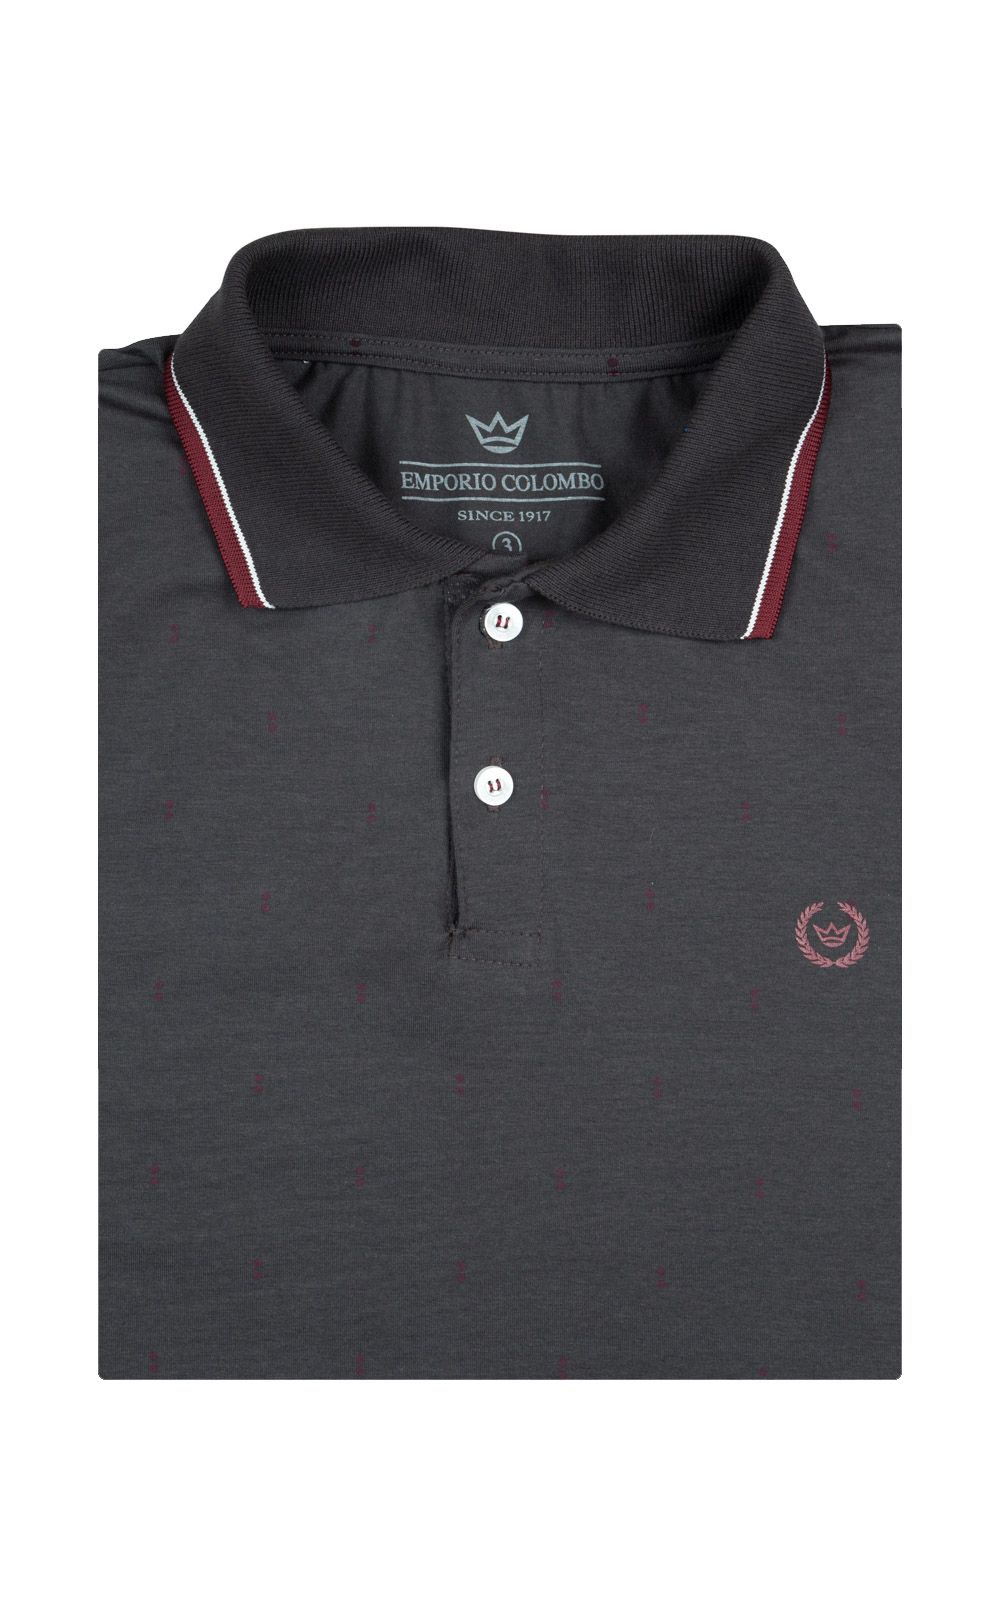 Foto 4 - Camisa Polo Masculina Cinza Escuro Estampada